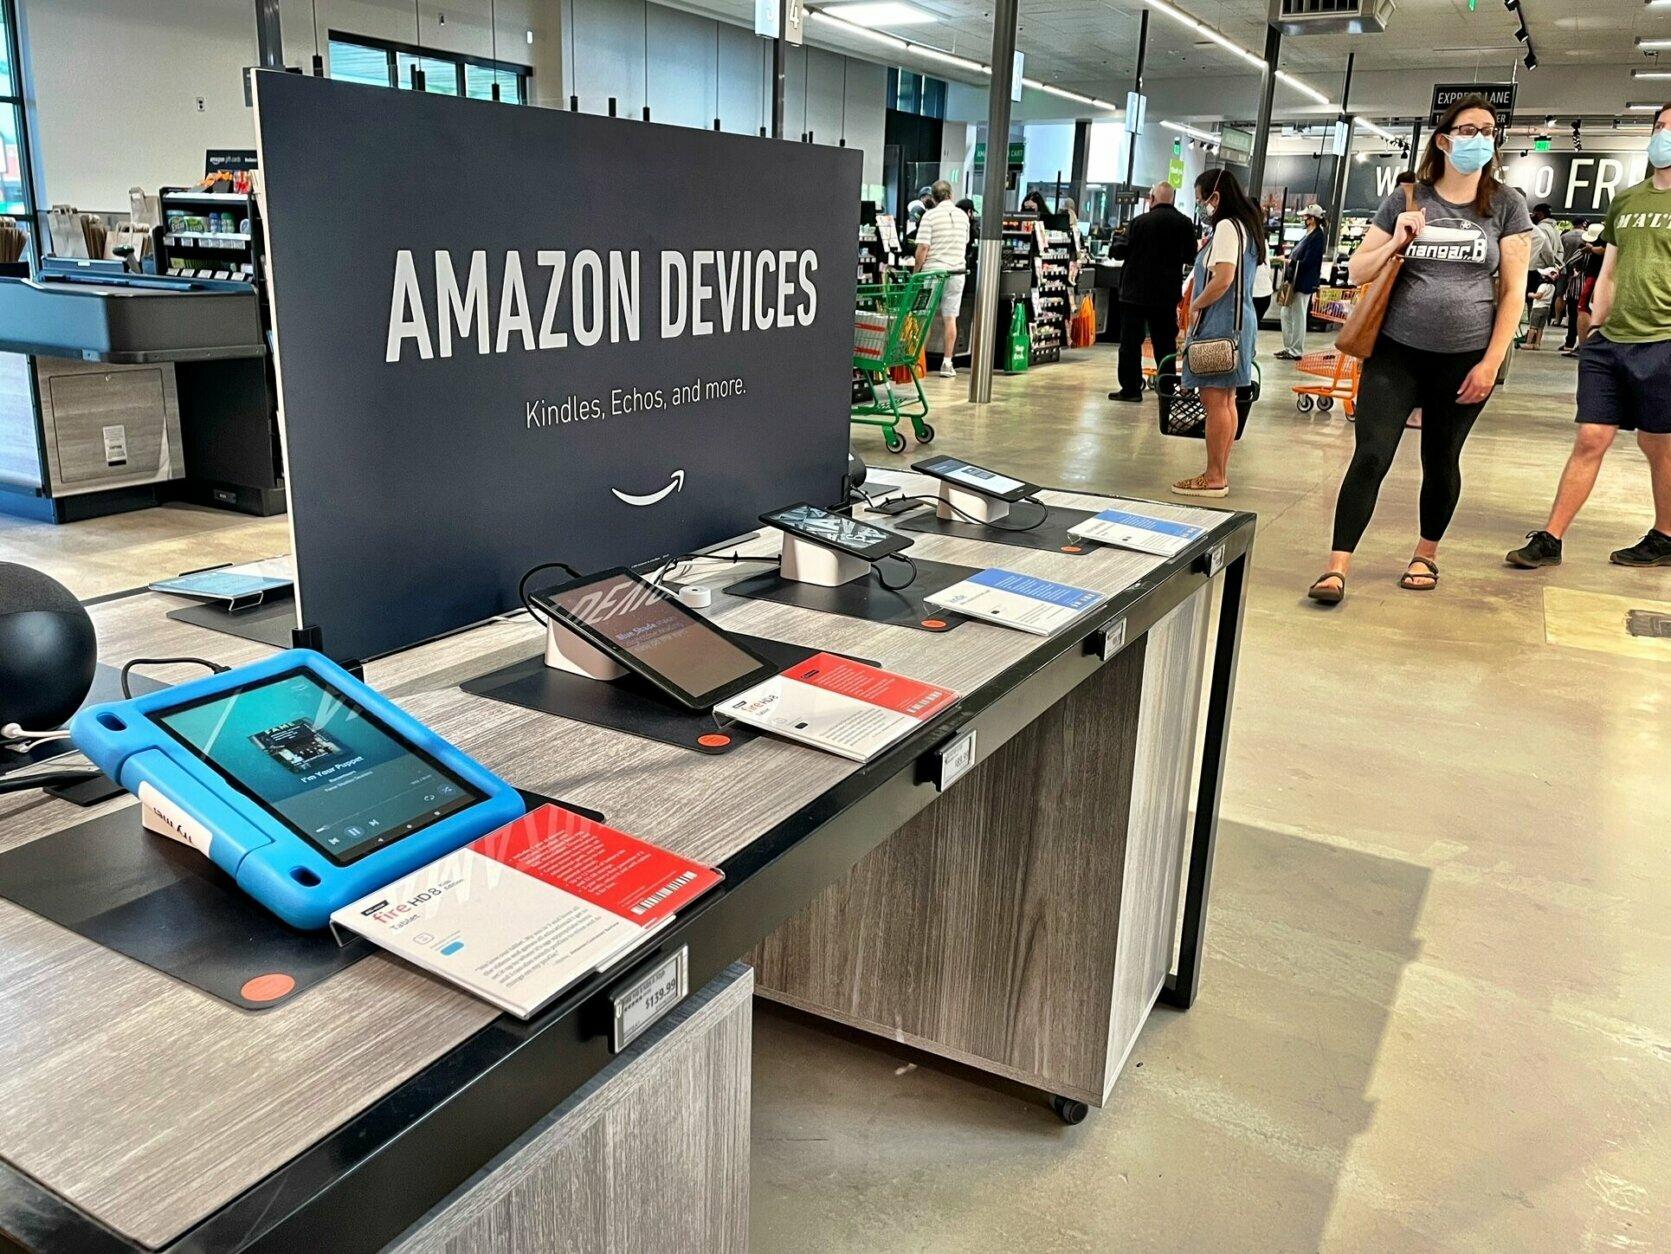 amazon fresh devices